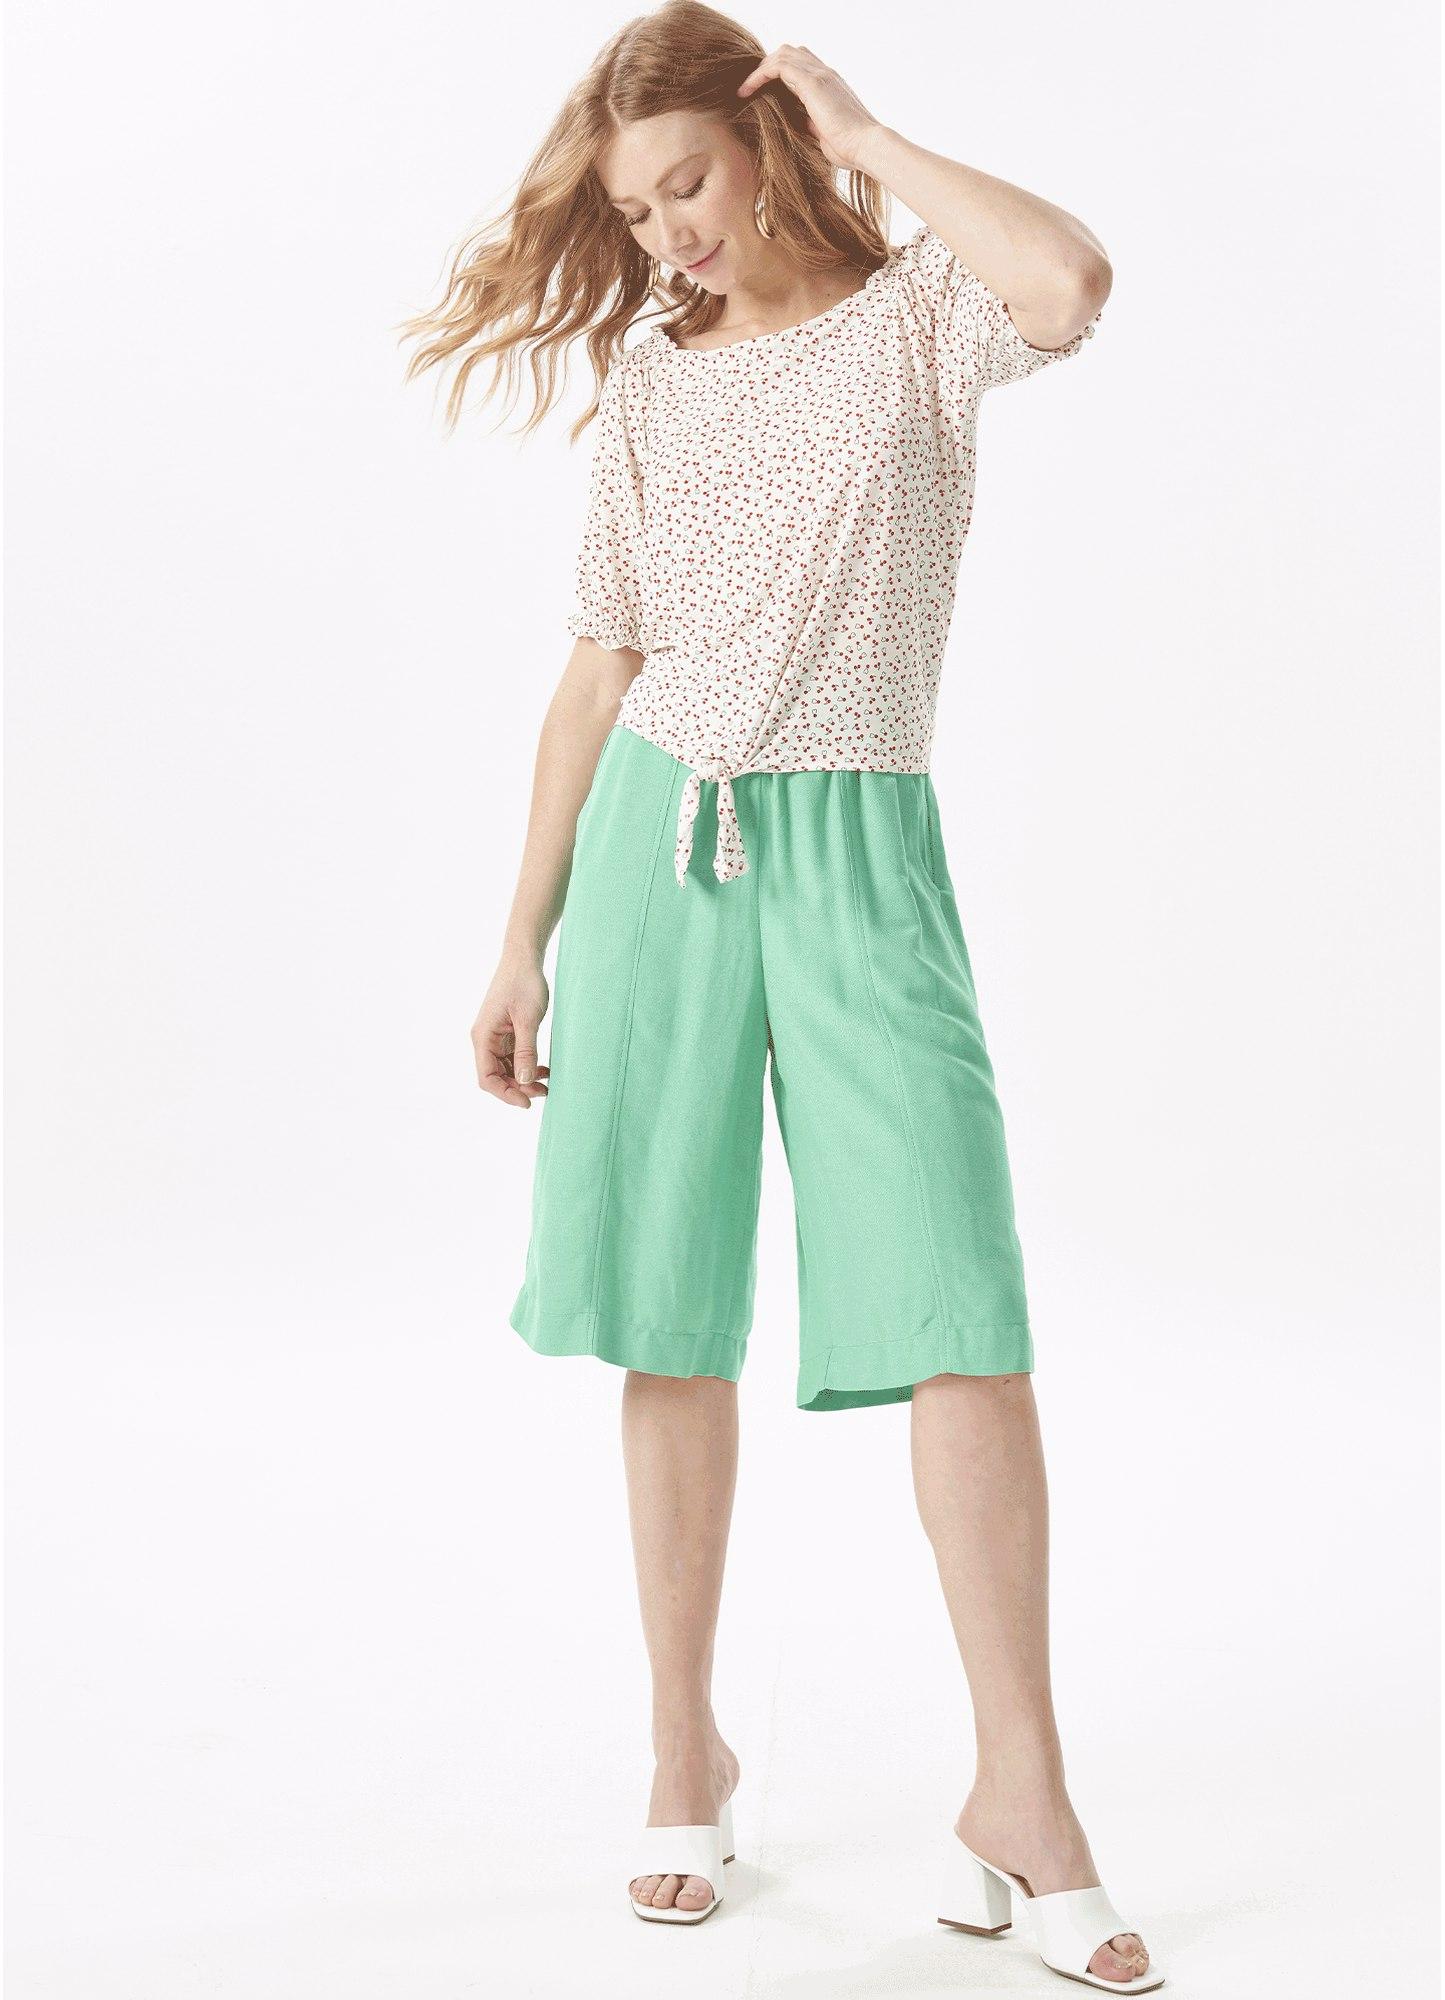 Blusa Feminina Plus Size Bata Jersey Estampada Elástico Mangas e Nó